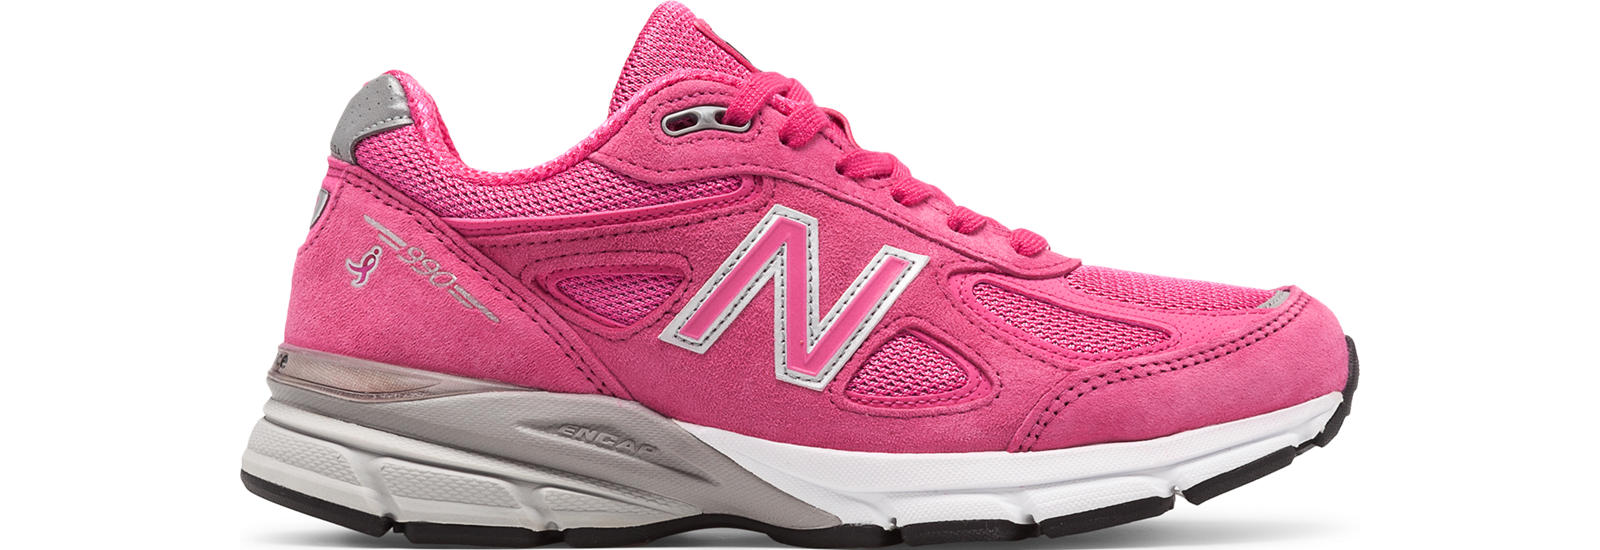 New Balance 990 rosa